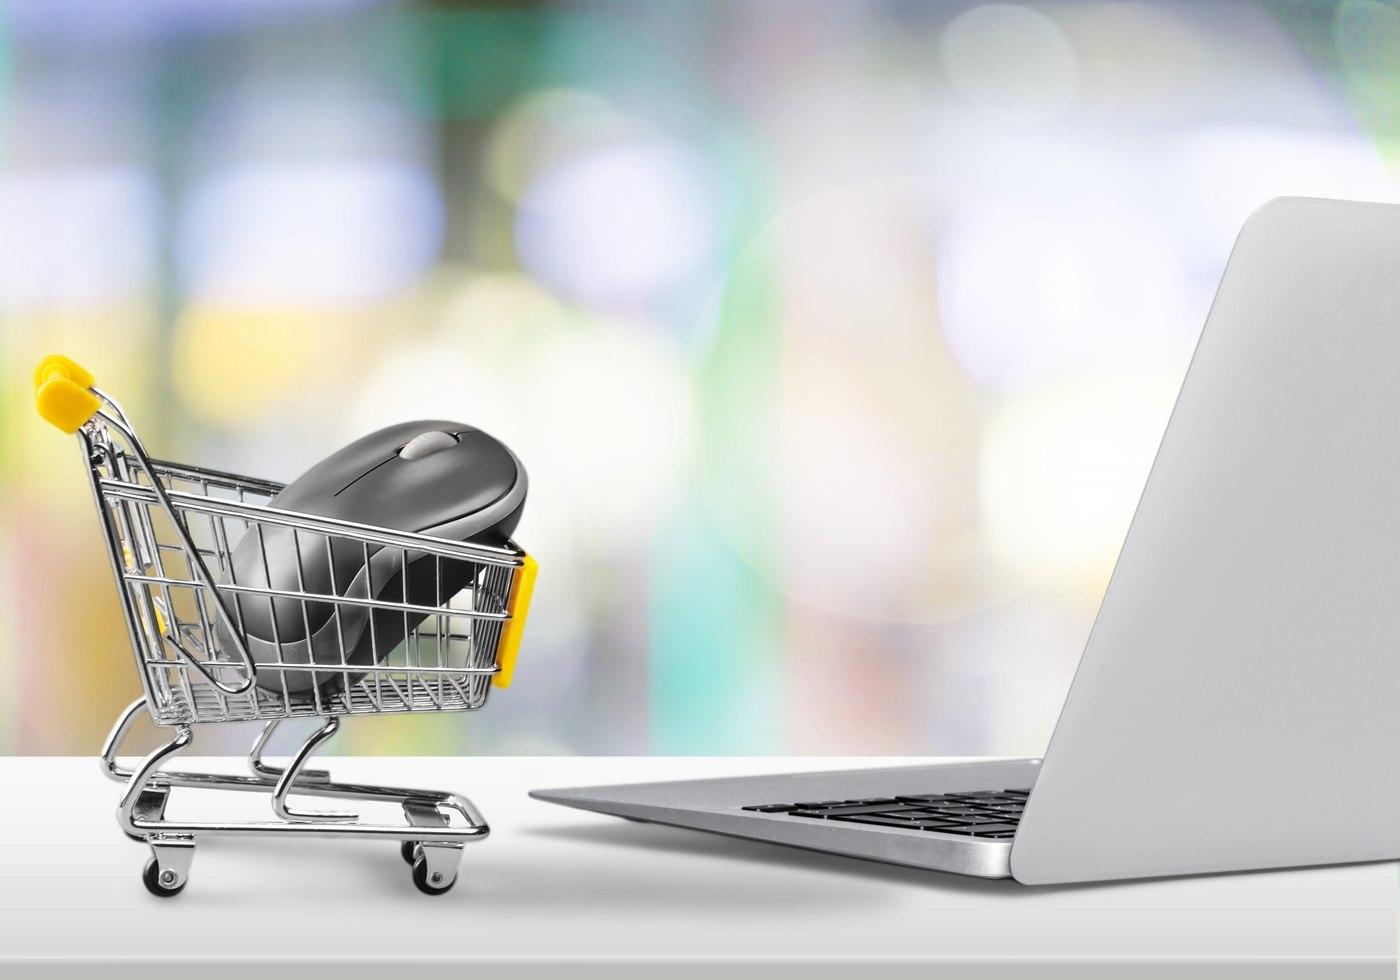 Procurement in Commercial E-commerce Portals